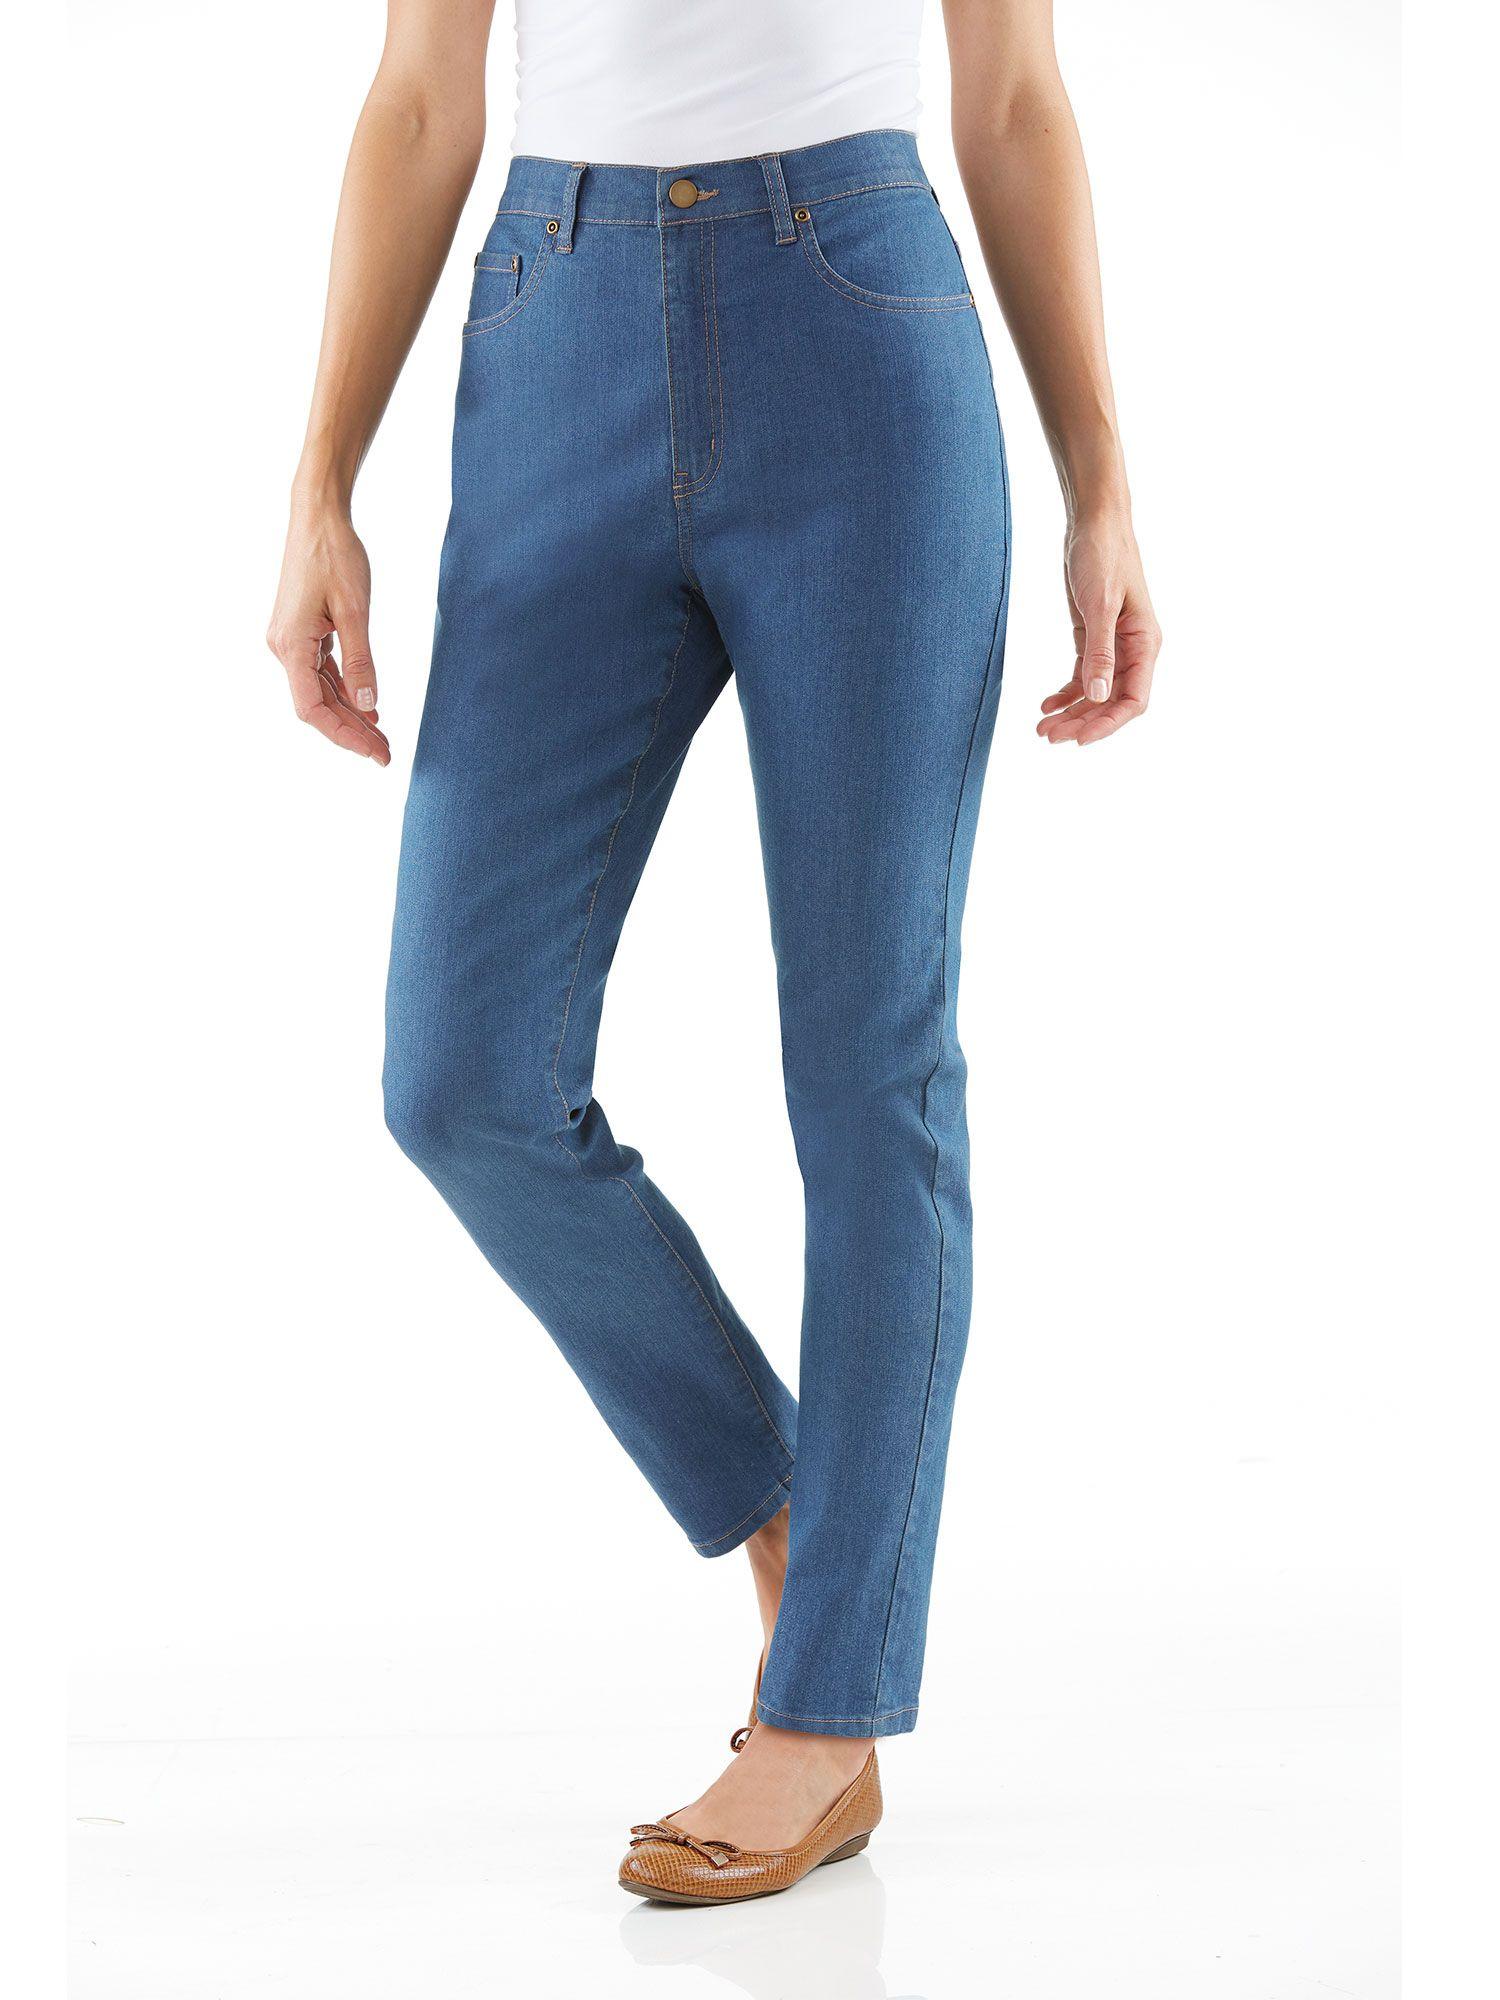 jeans with stretch waist womens